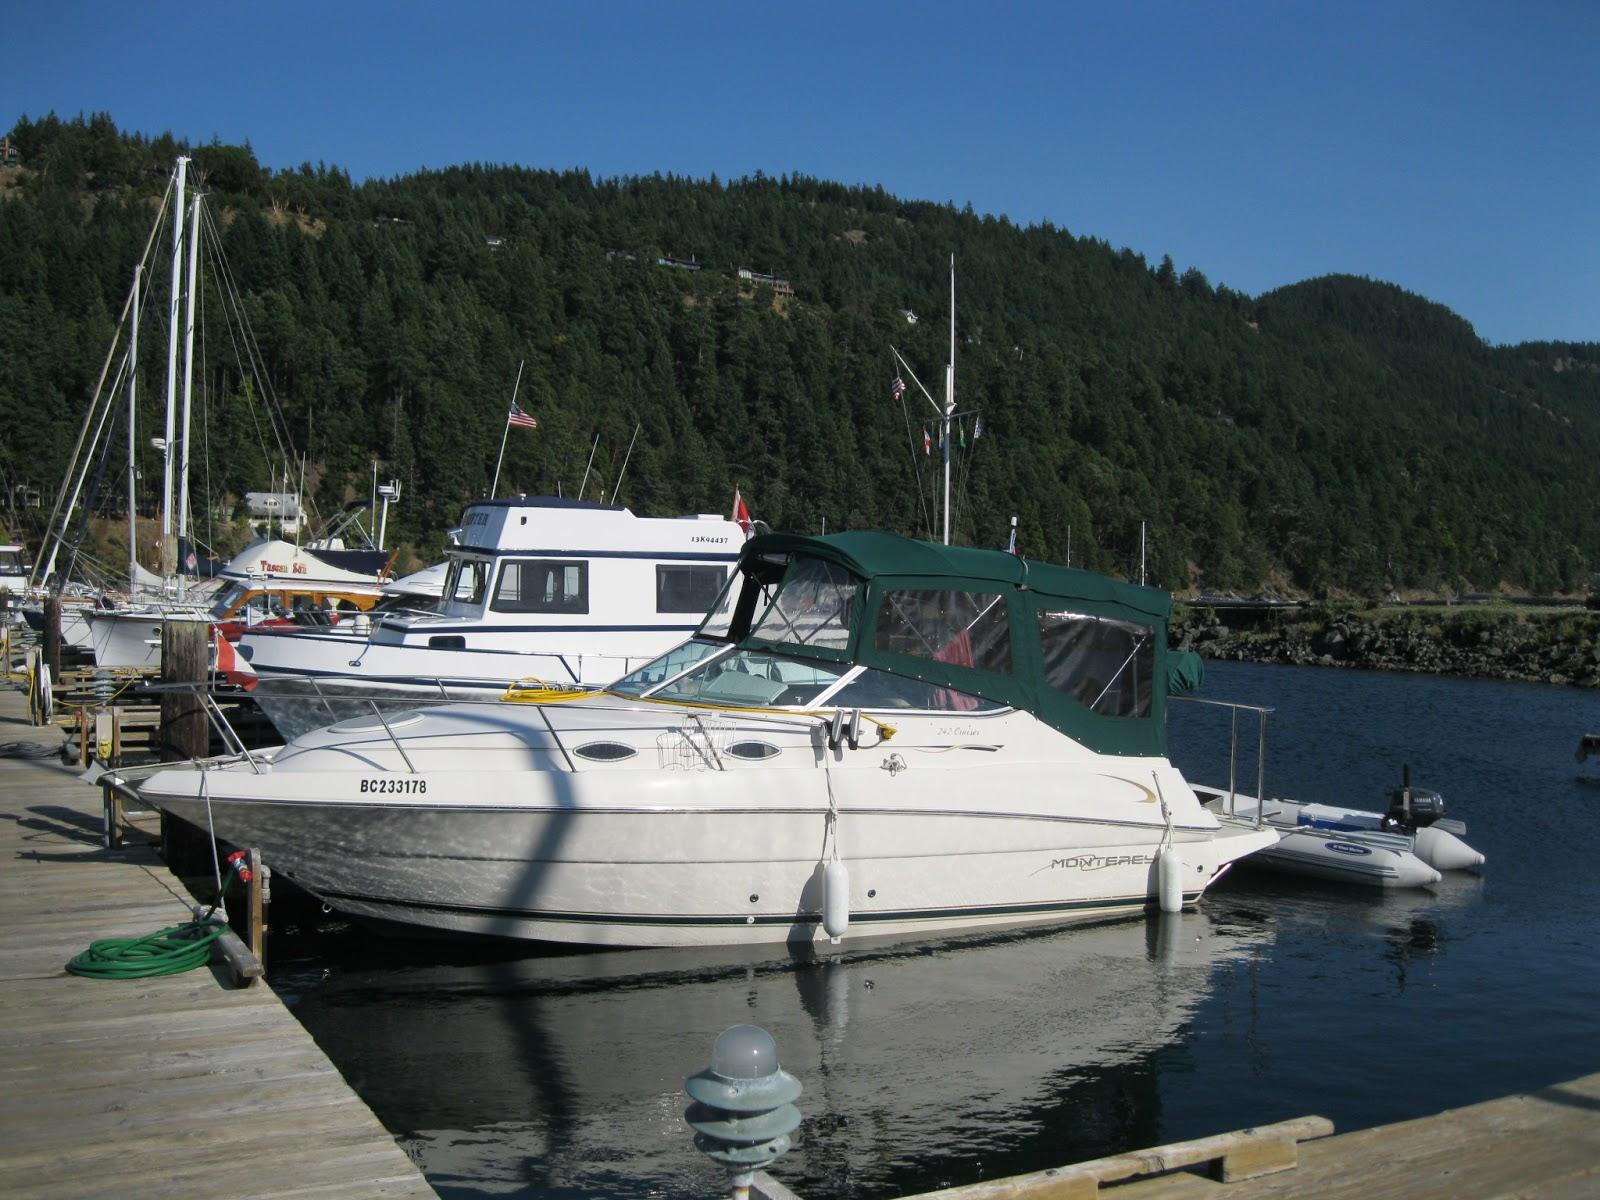 Monterey 242 boat names